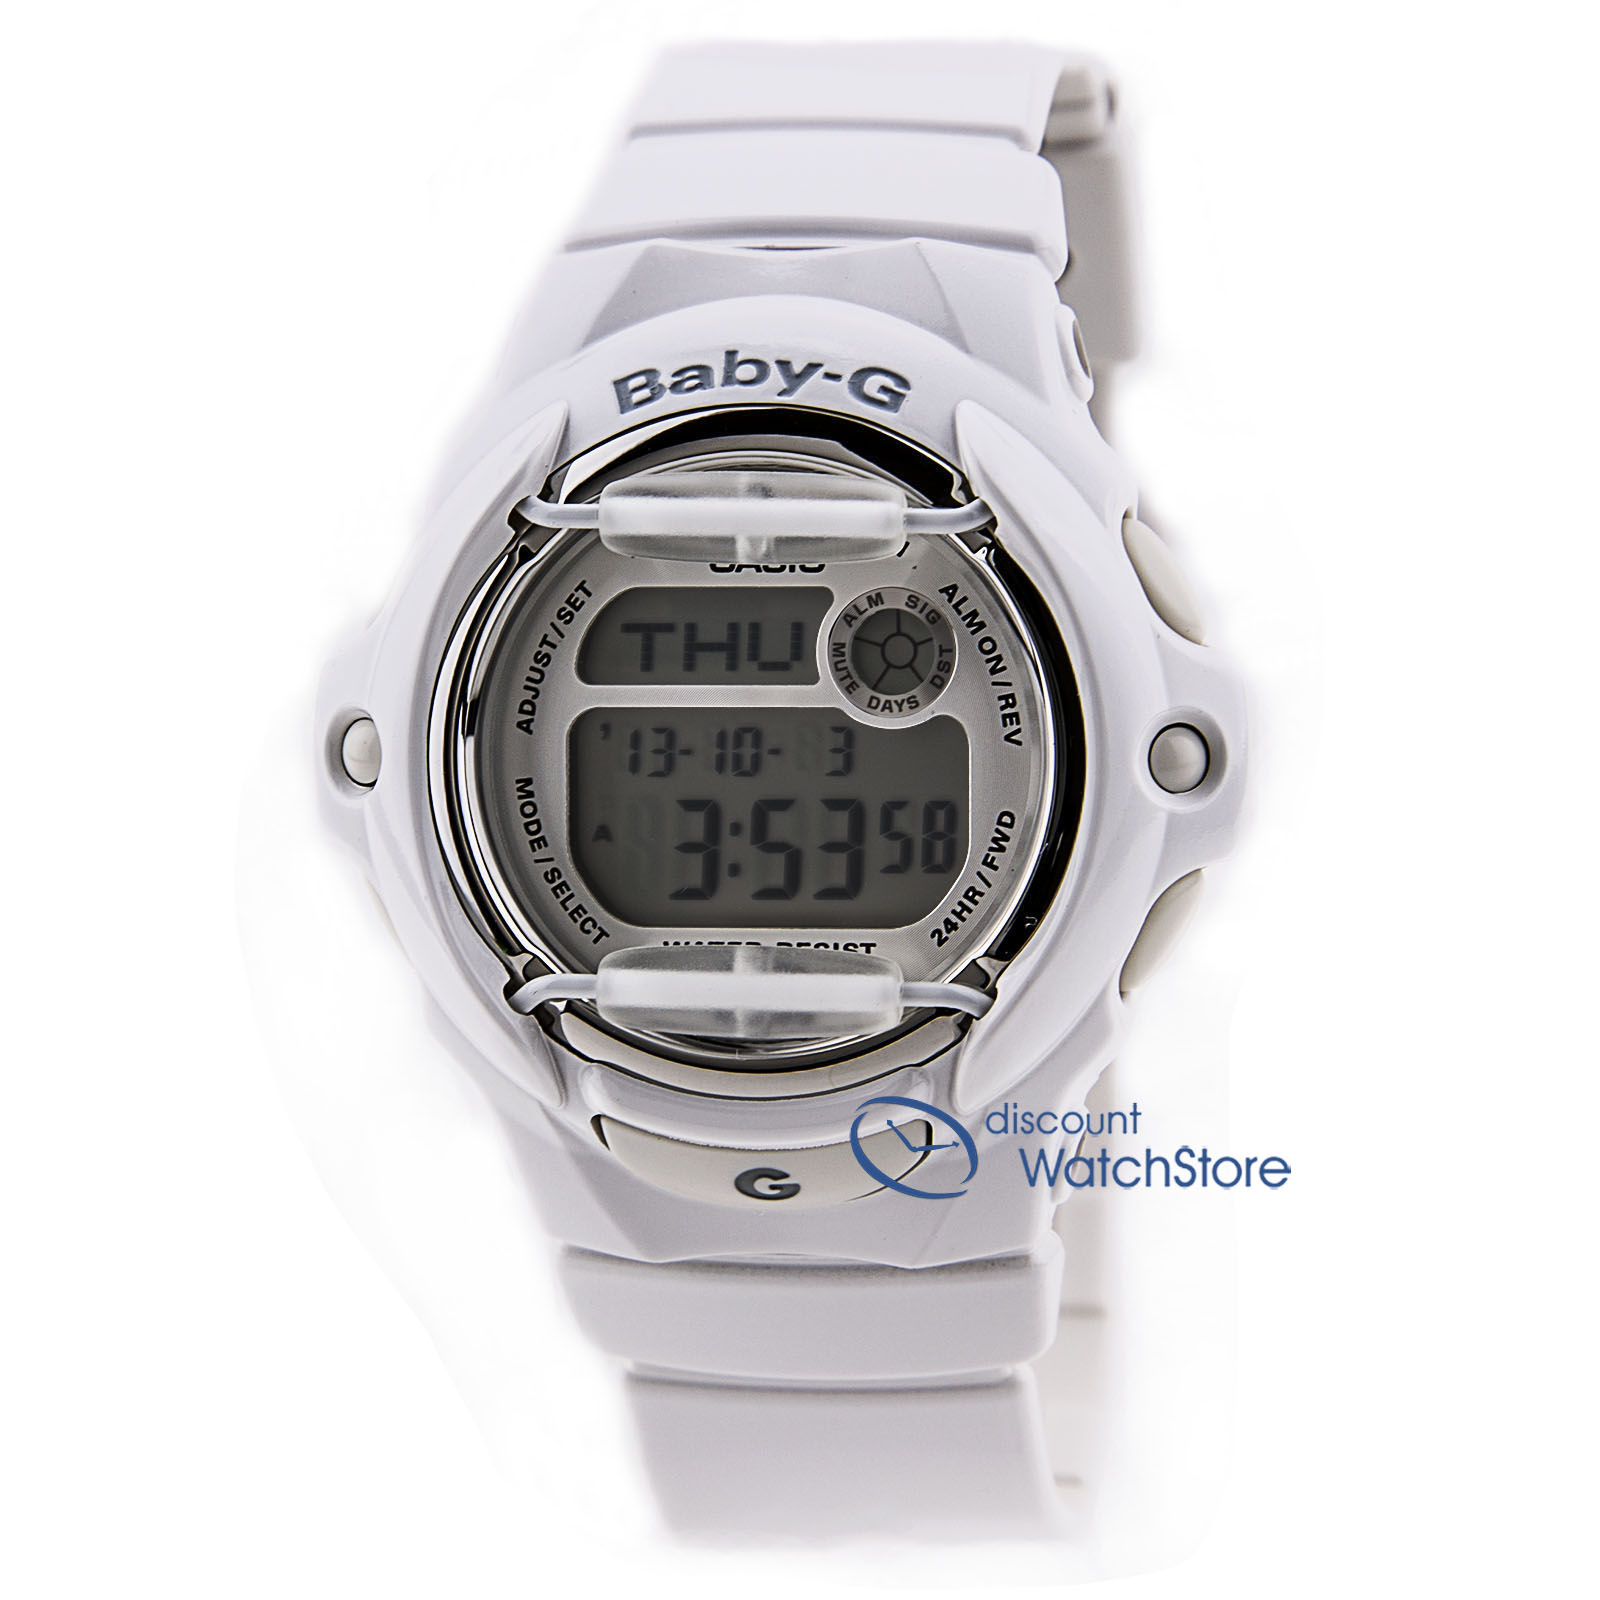 Casio BG169R-7A